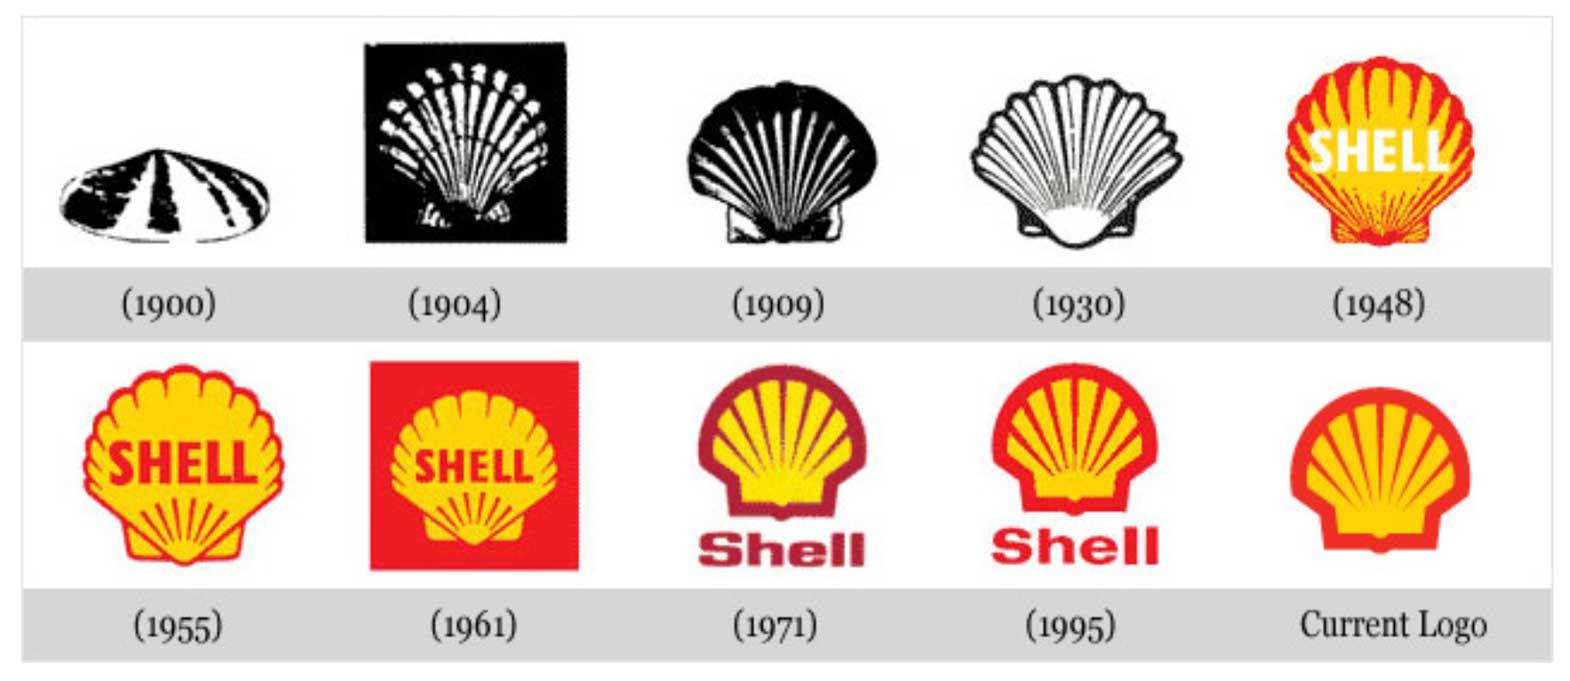 Shell logo progression